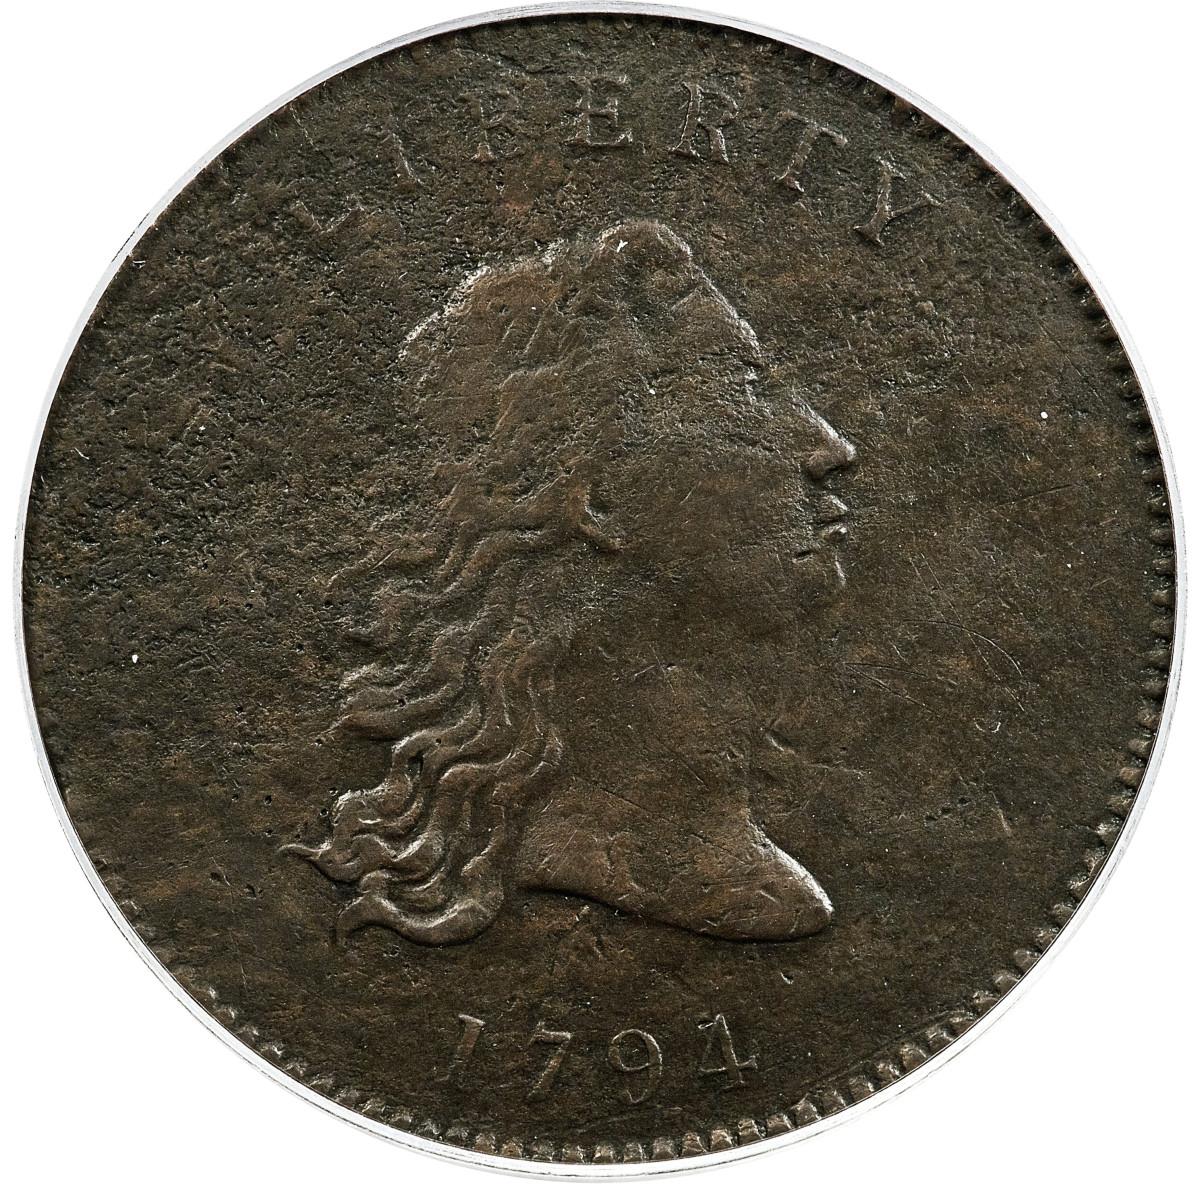 1794 No Stars Flowing Hair dollar prototype. (Image courtesy Heritage Auctions, HA.com.)